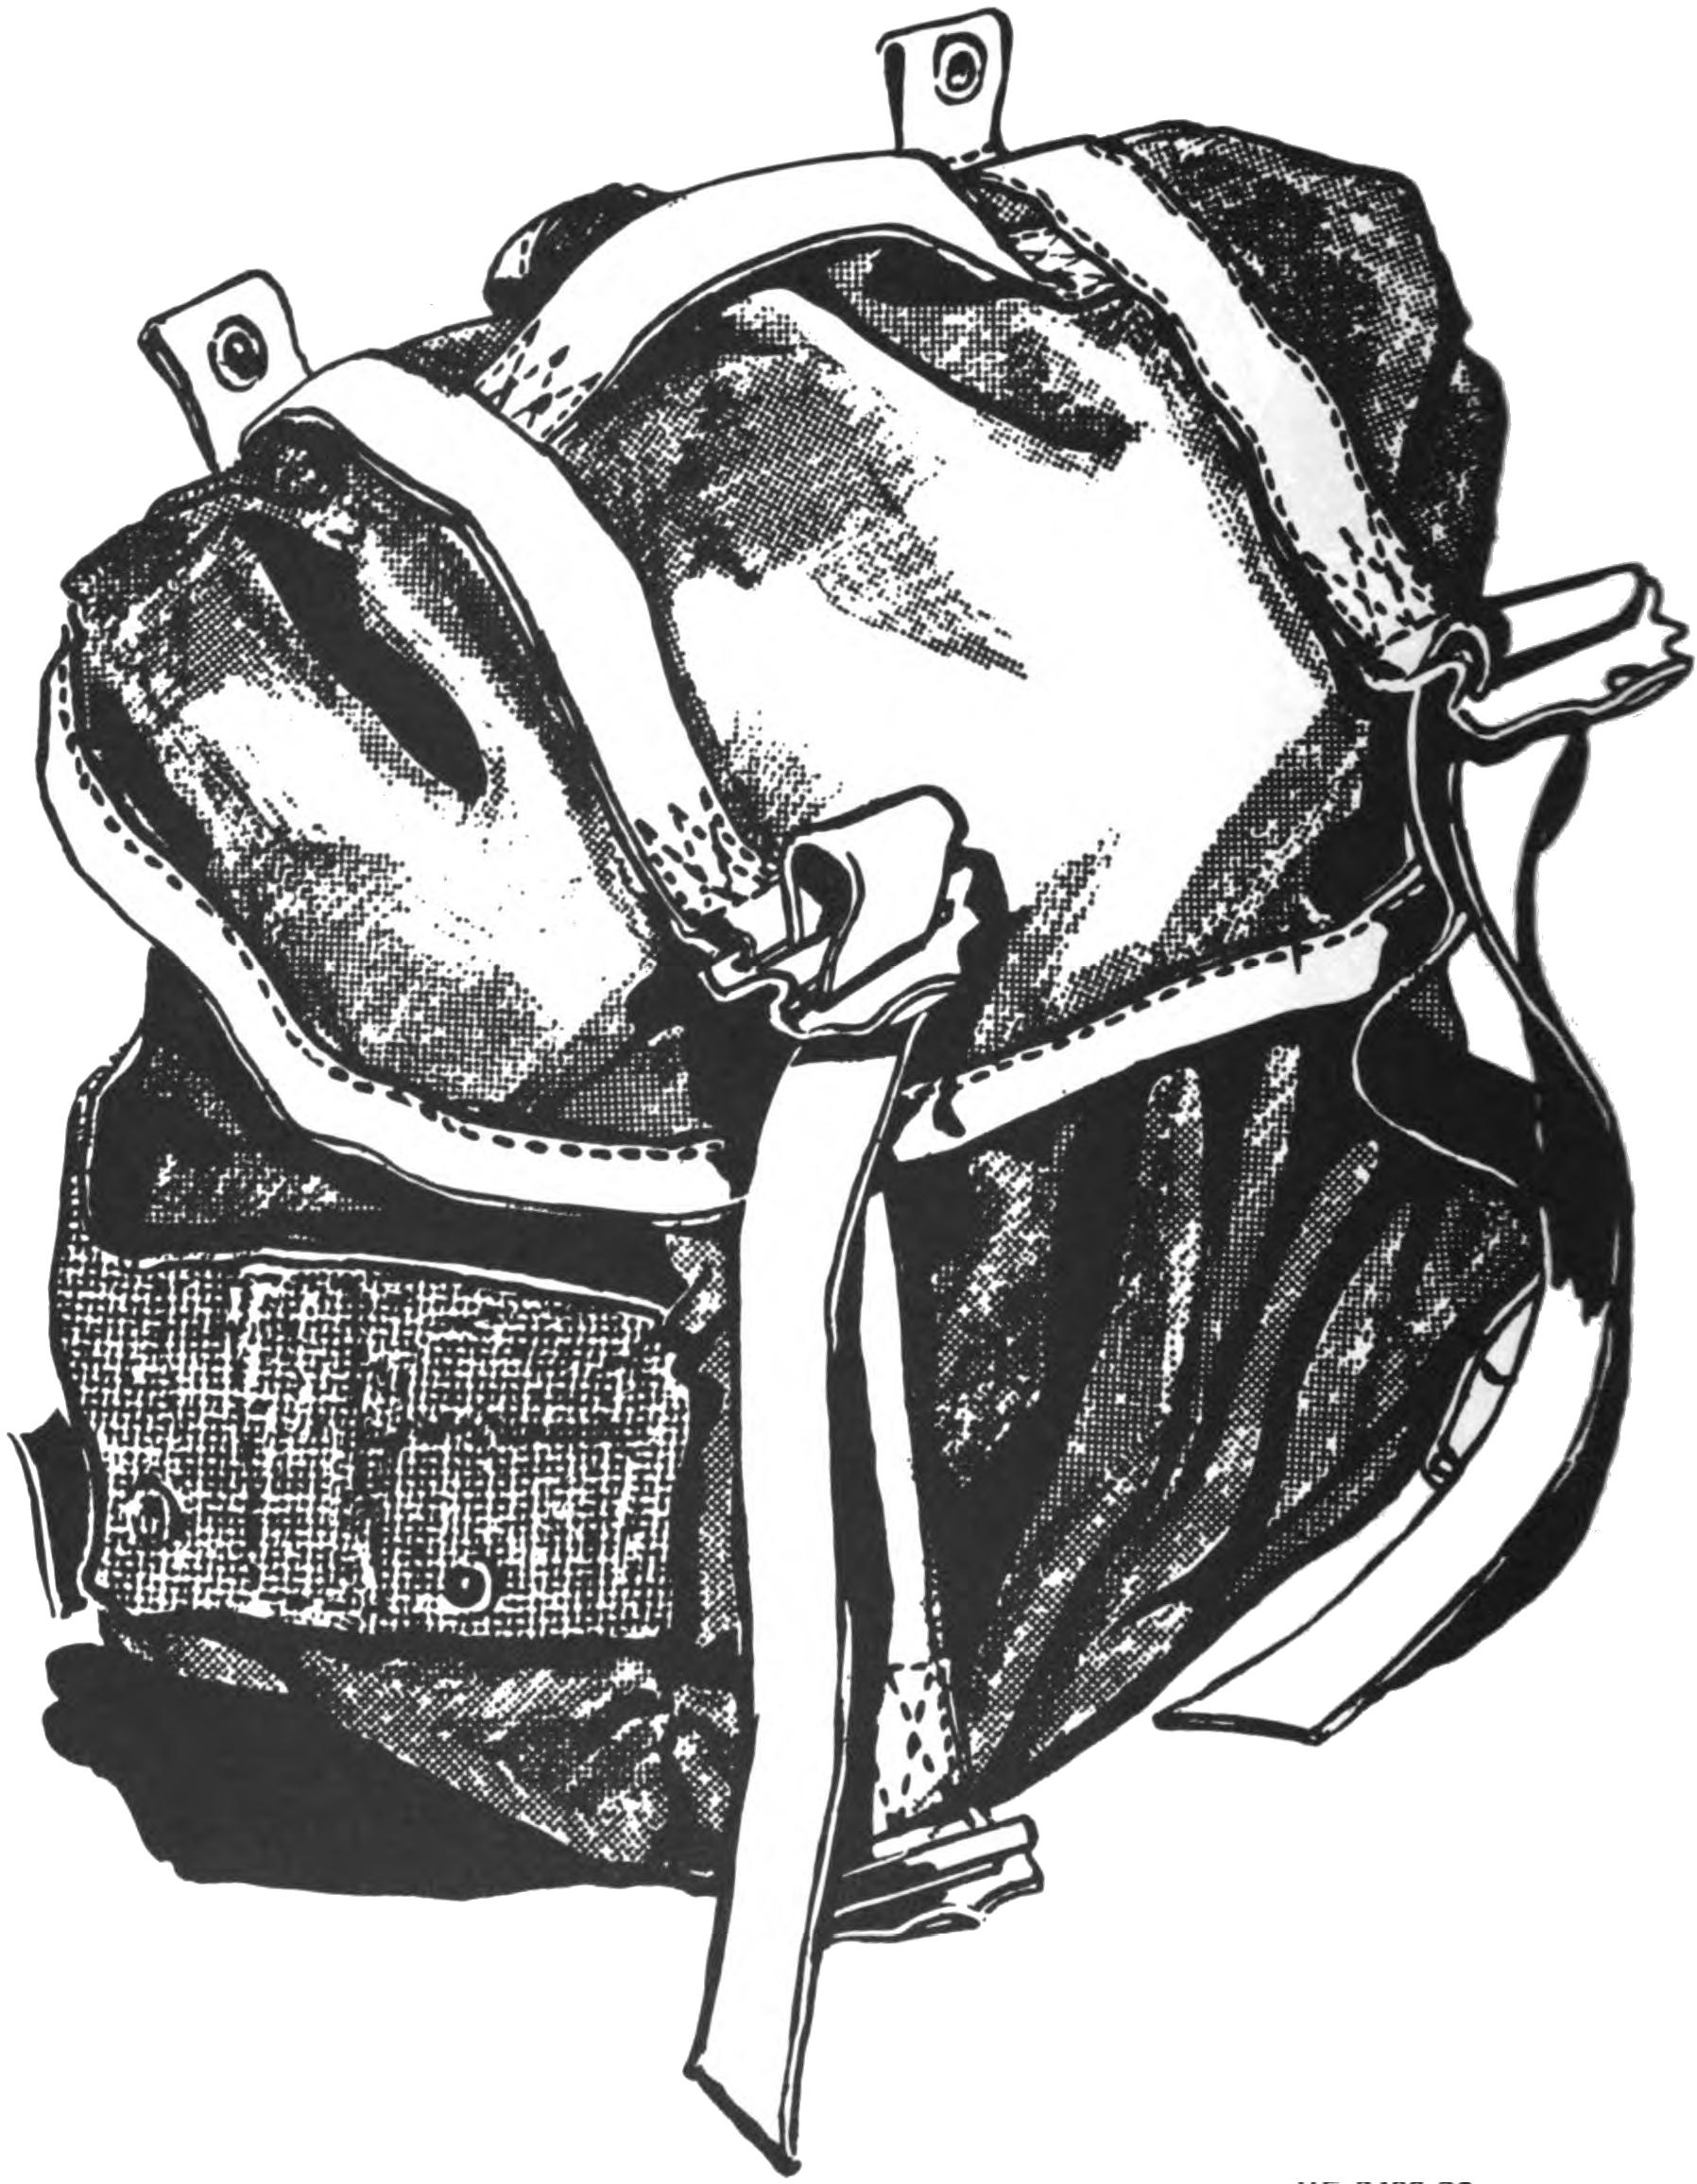 M-1967 field pack